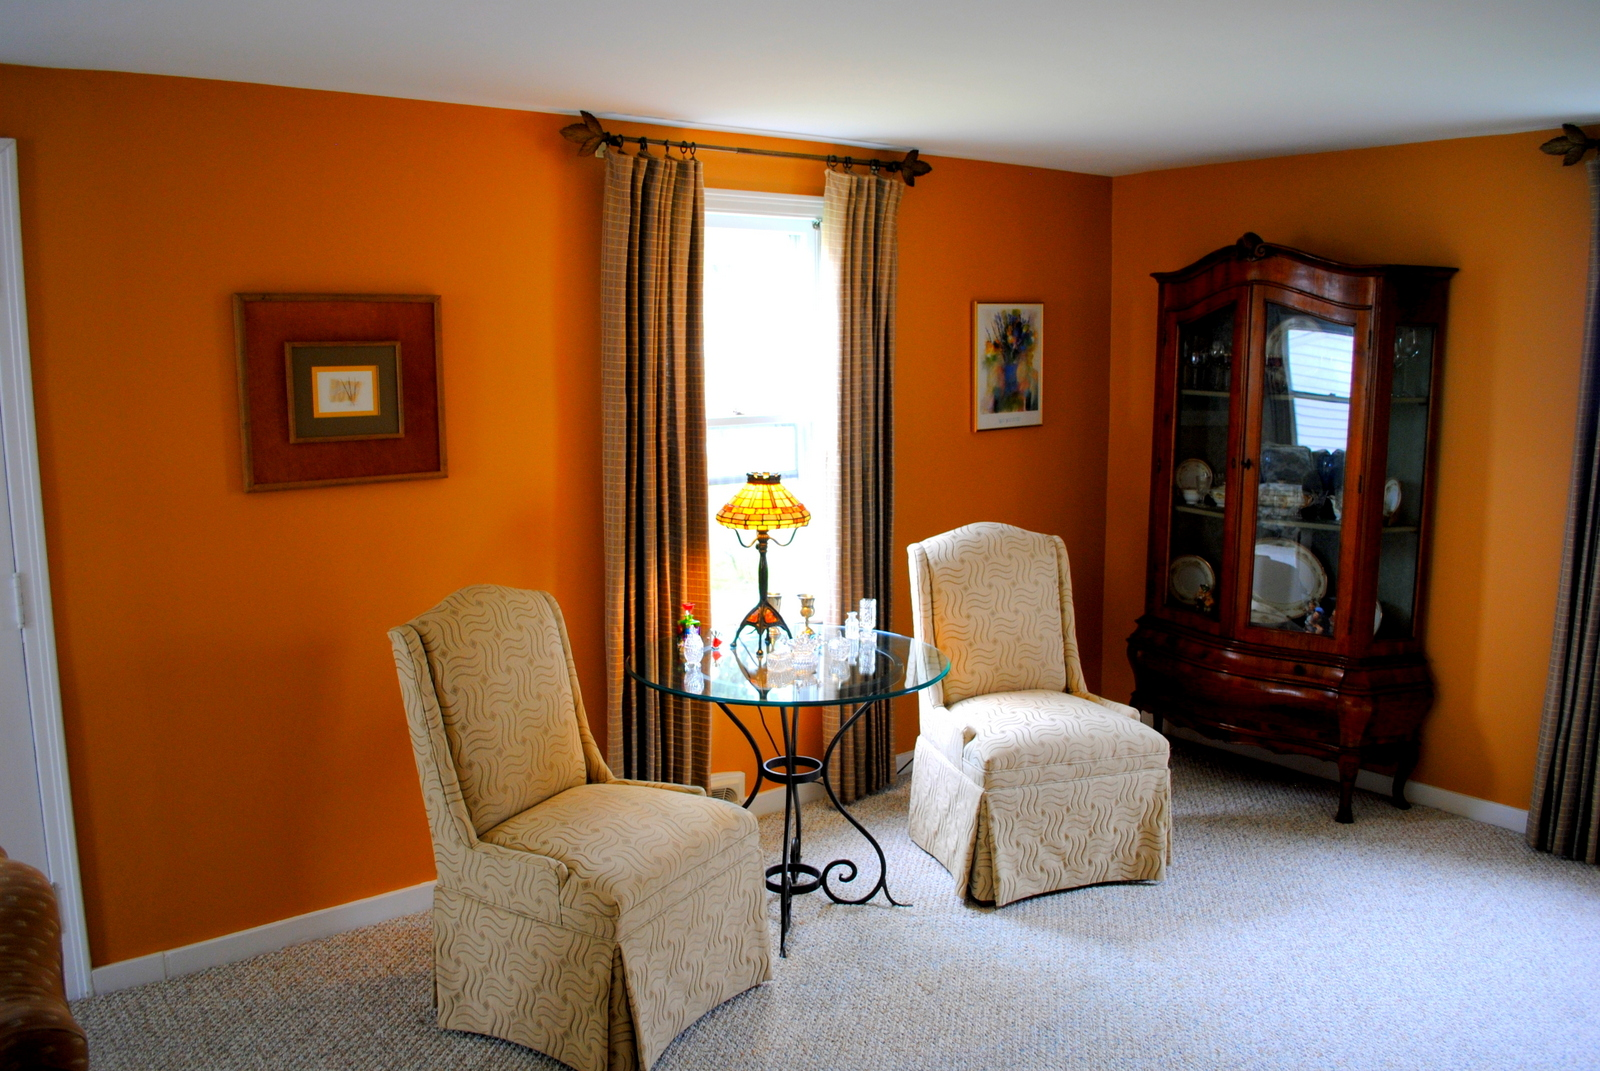 1000 Images About Pumpkin Walls On Pinterest Orange